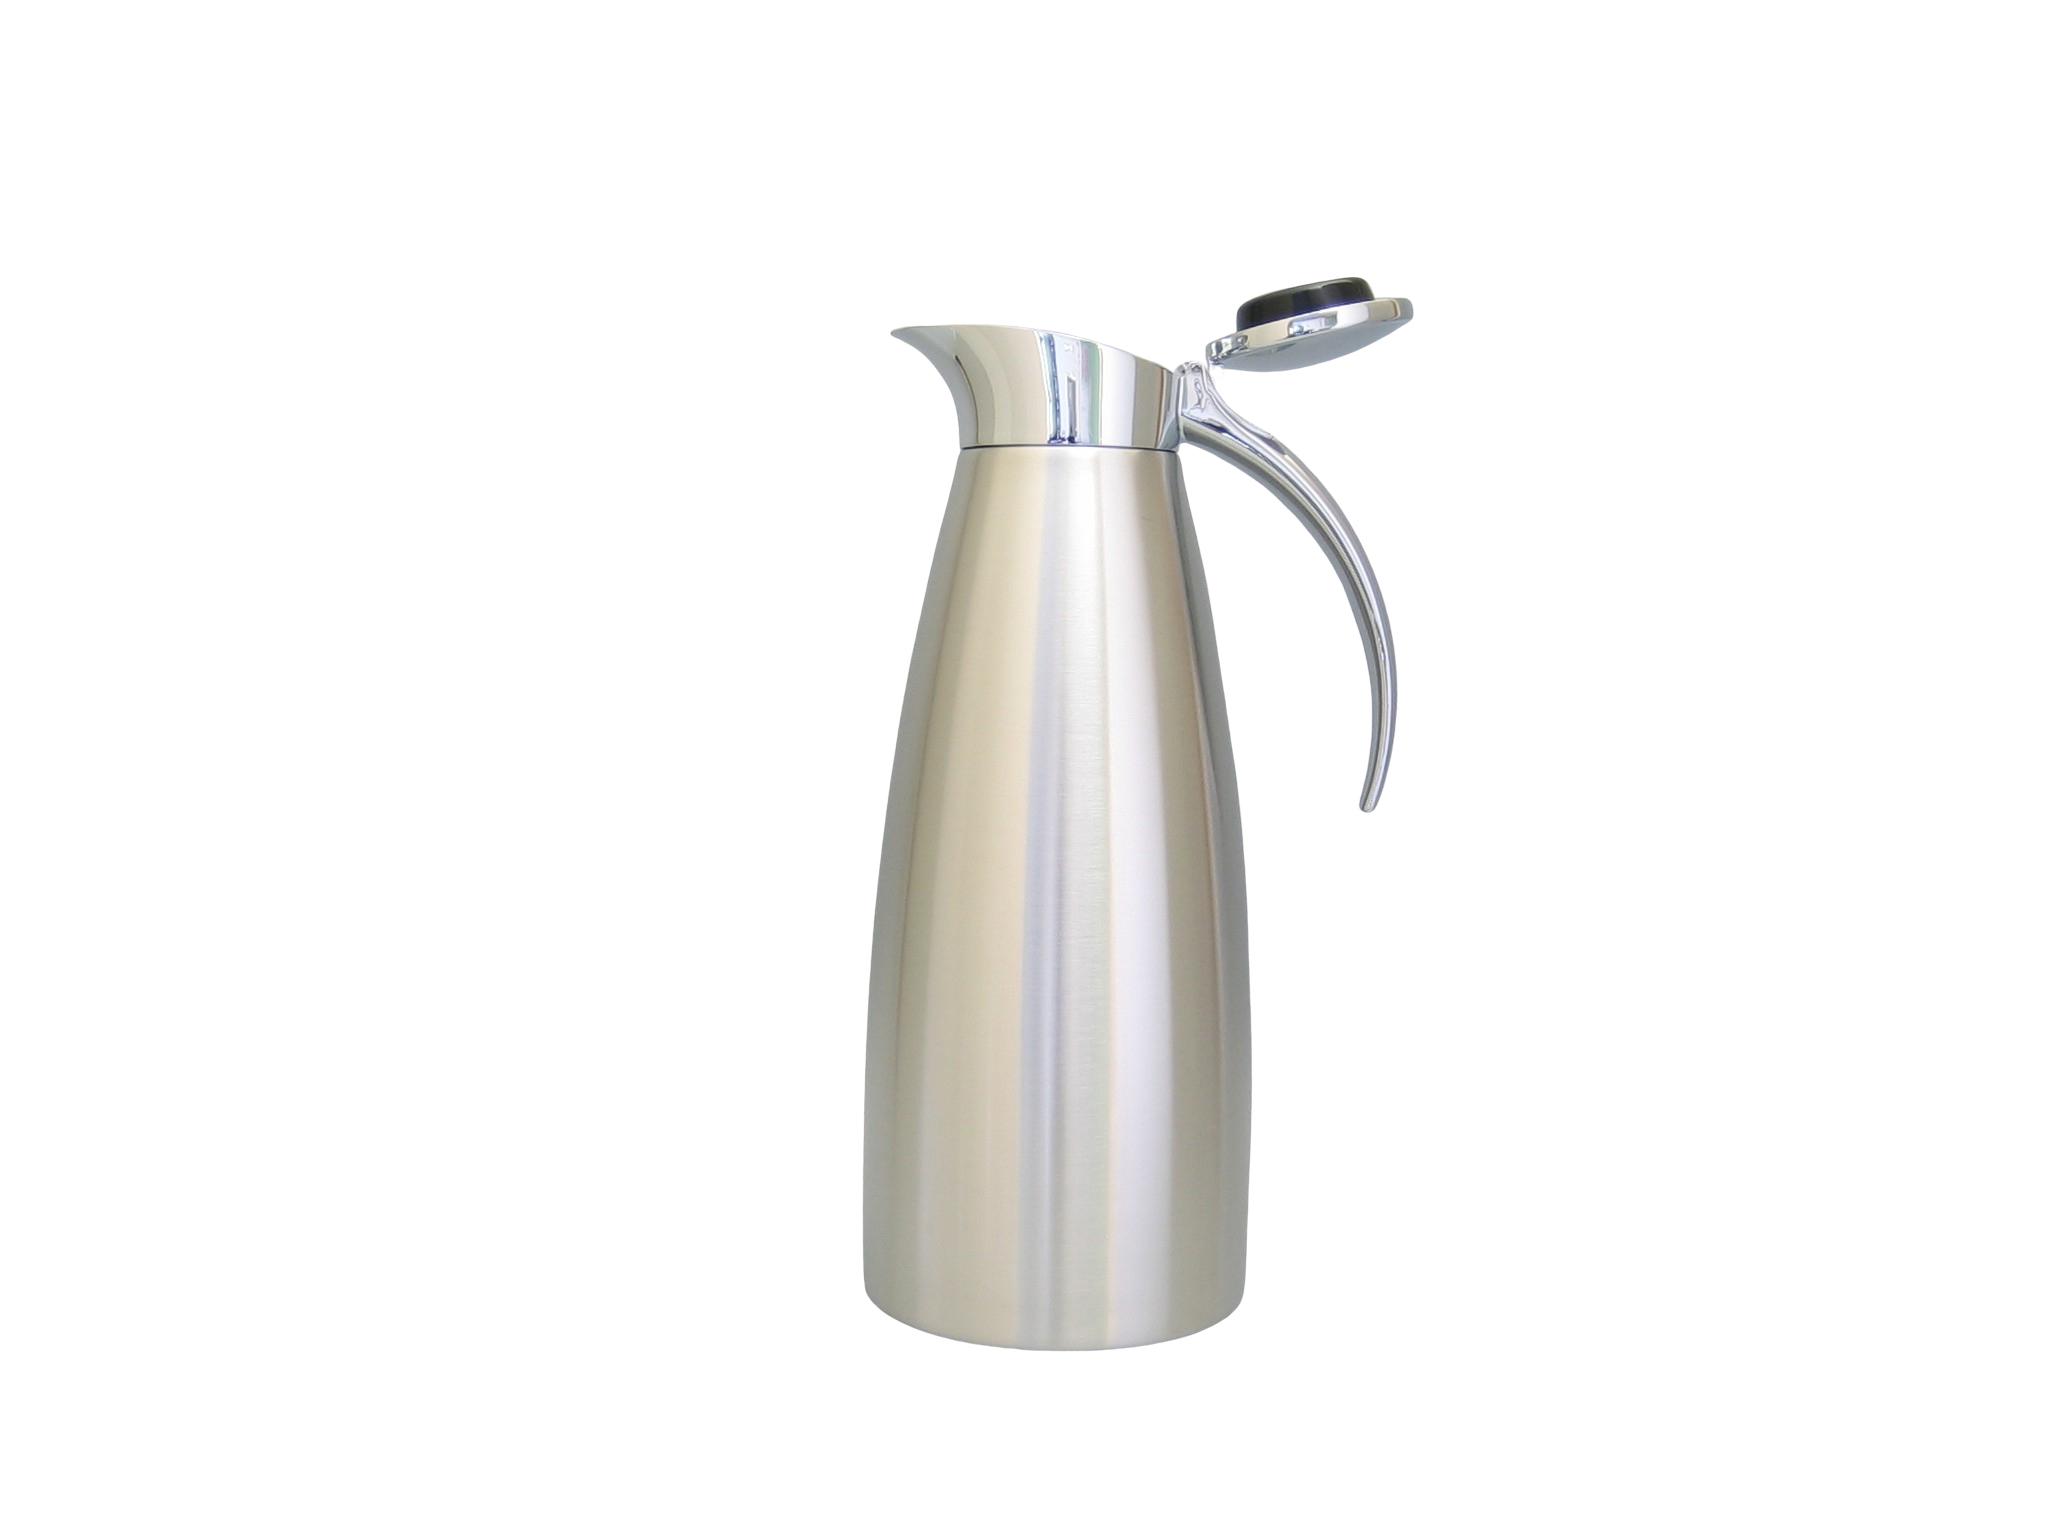 TUNDRA10-900 - Pichet isotherme inox incassable brossé 1.0 L - Isobel